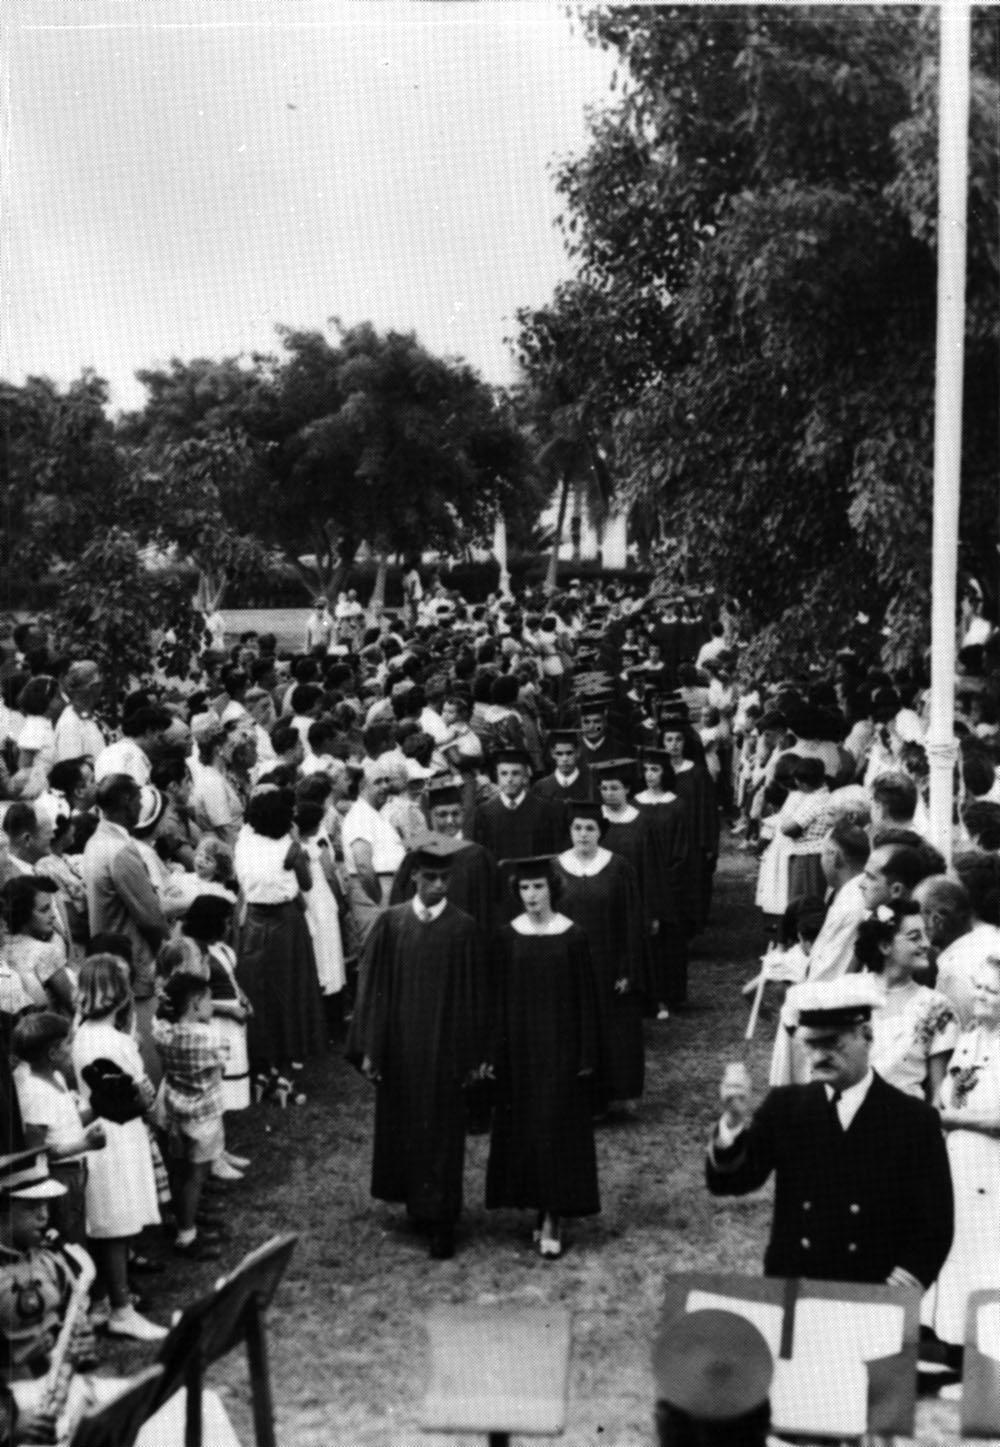 graduating class of 1950, Key West Floria